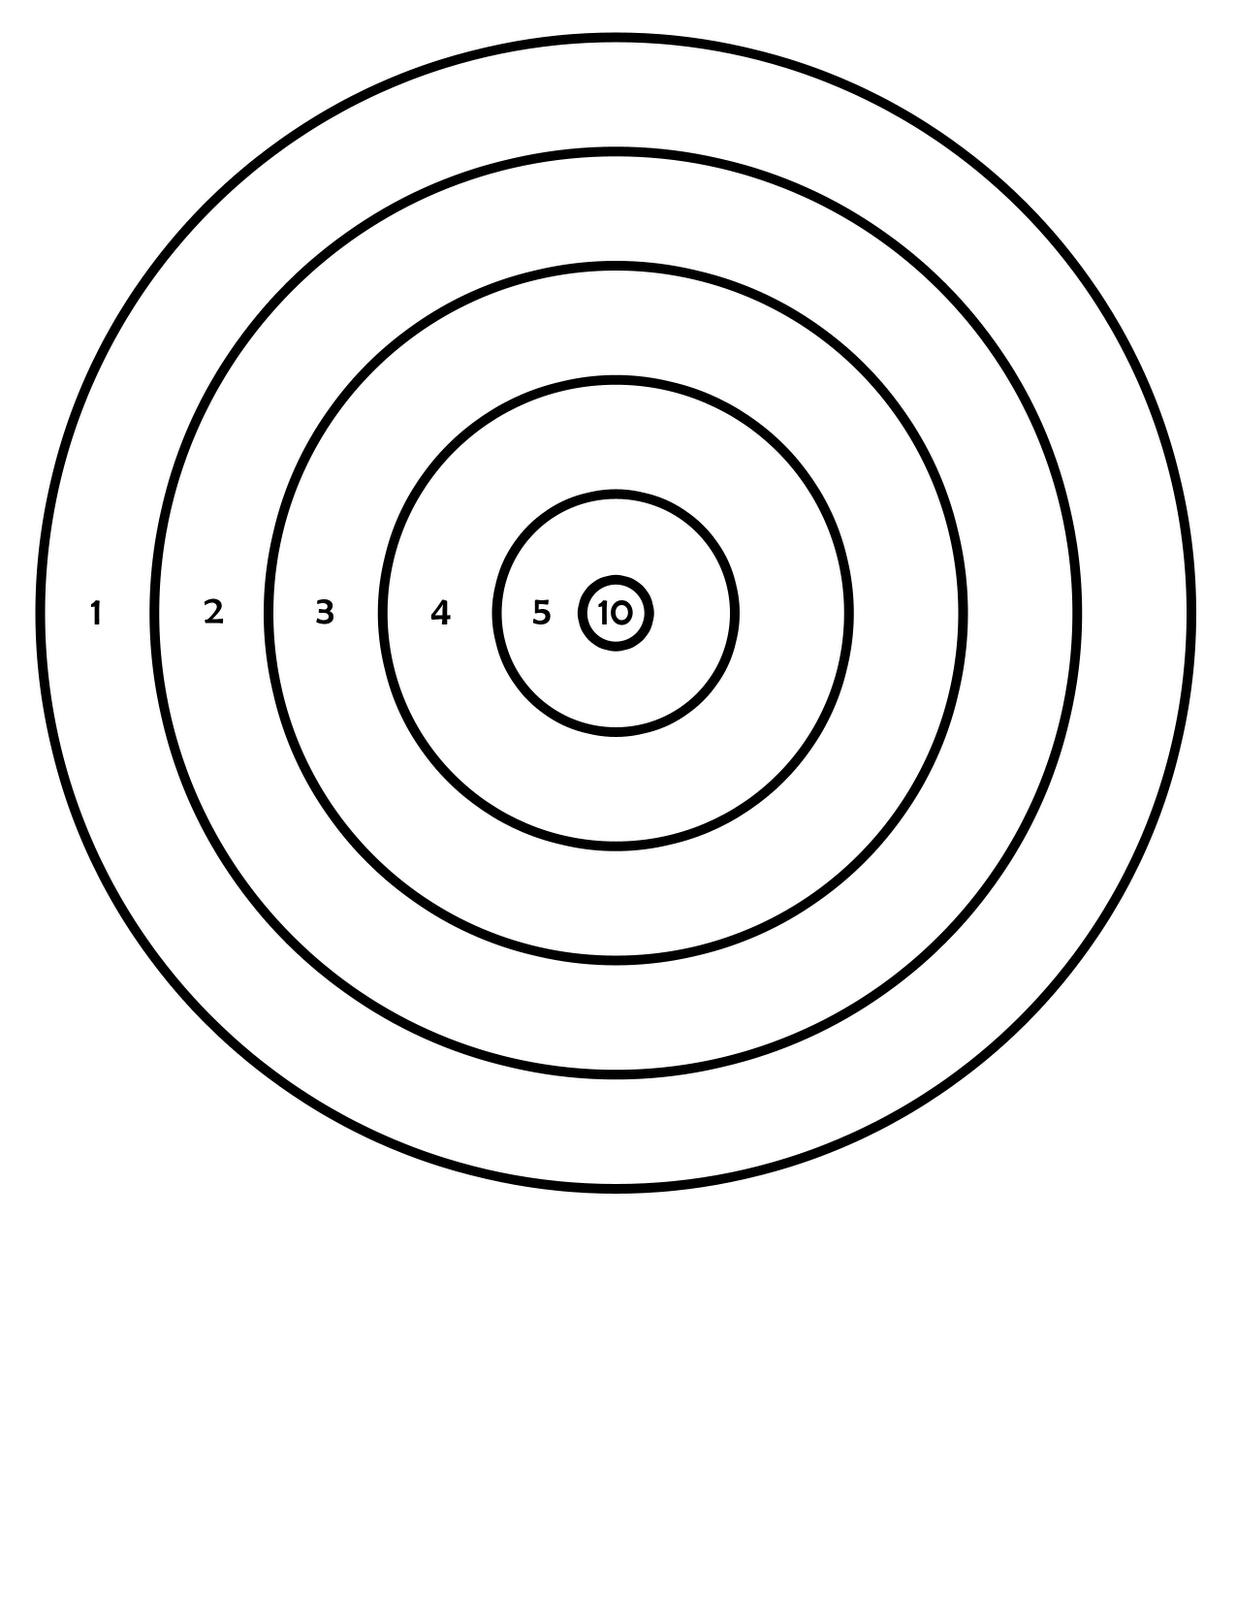 Printable Targets   411Toys: Free Printable Airsoft Targets - Free Printable Targets